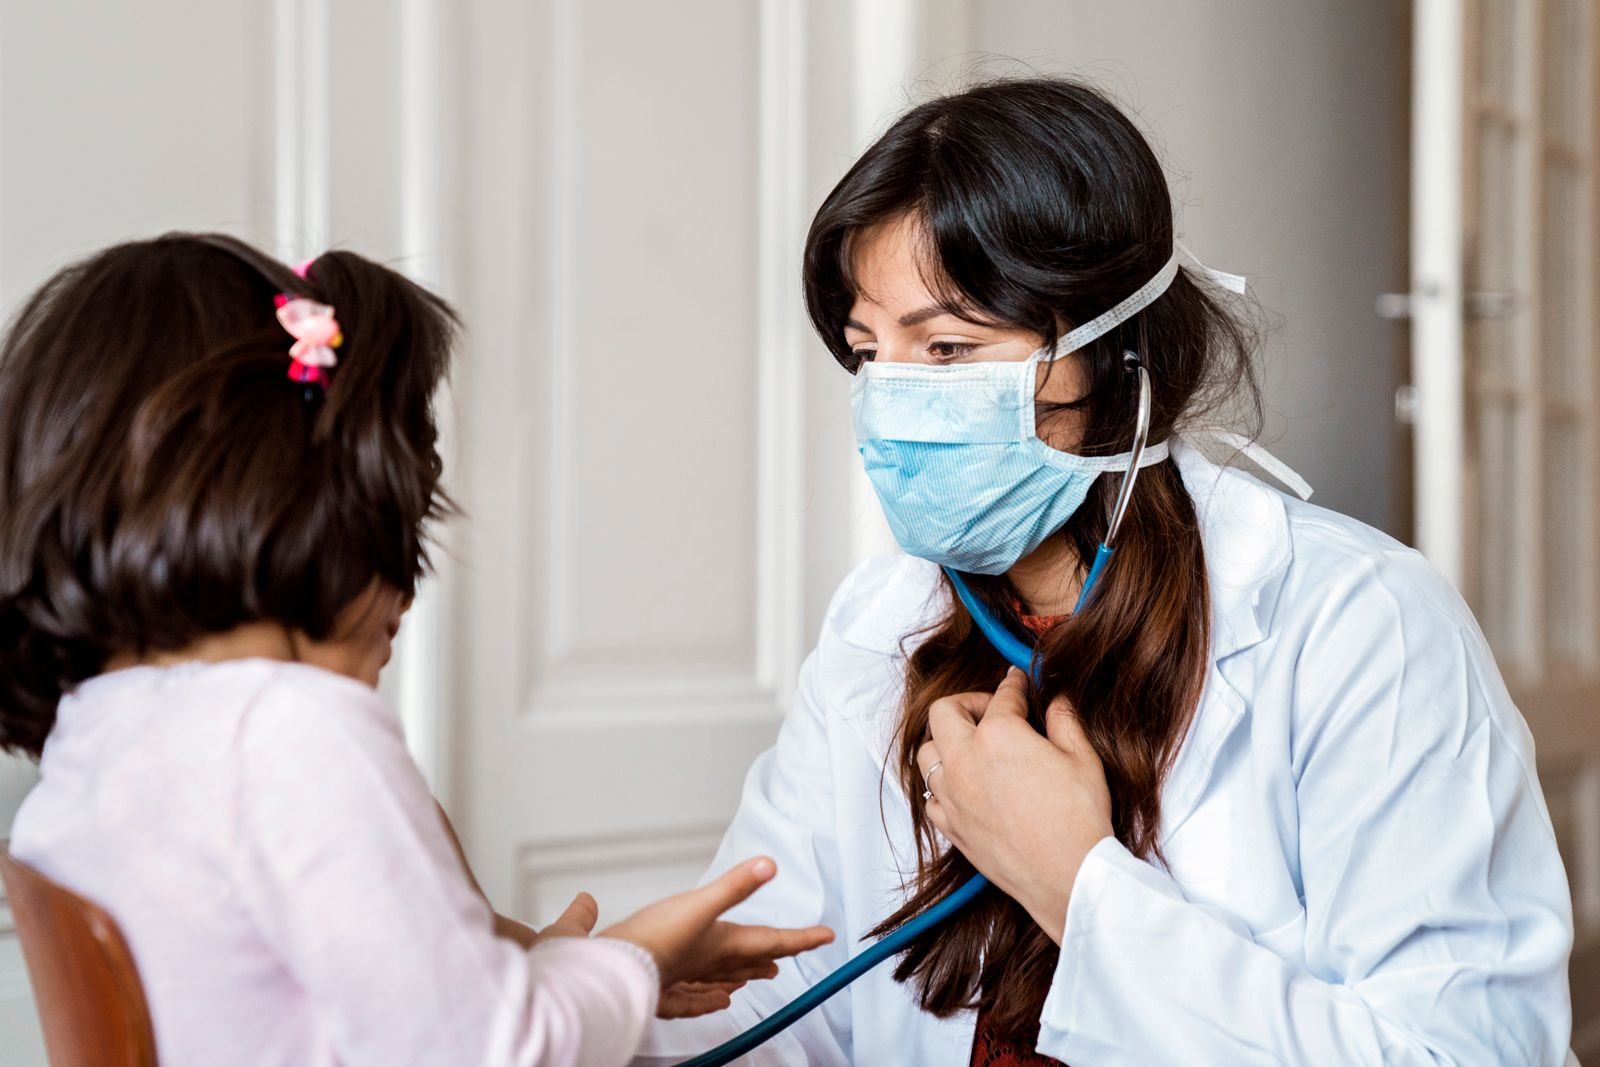 Female doctor examining preschool patient at home